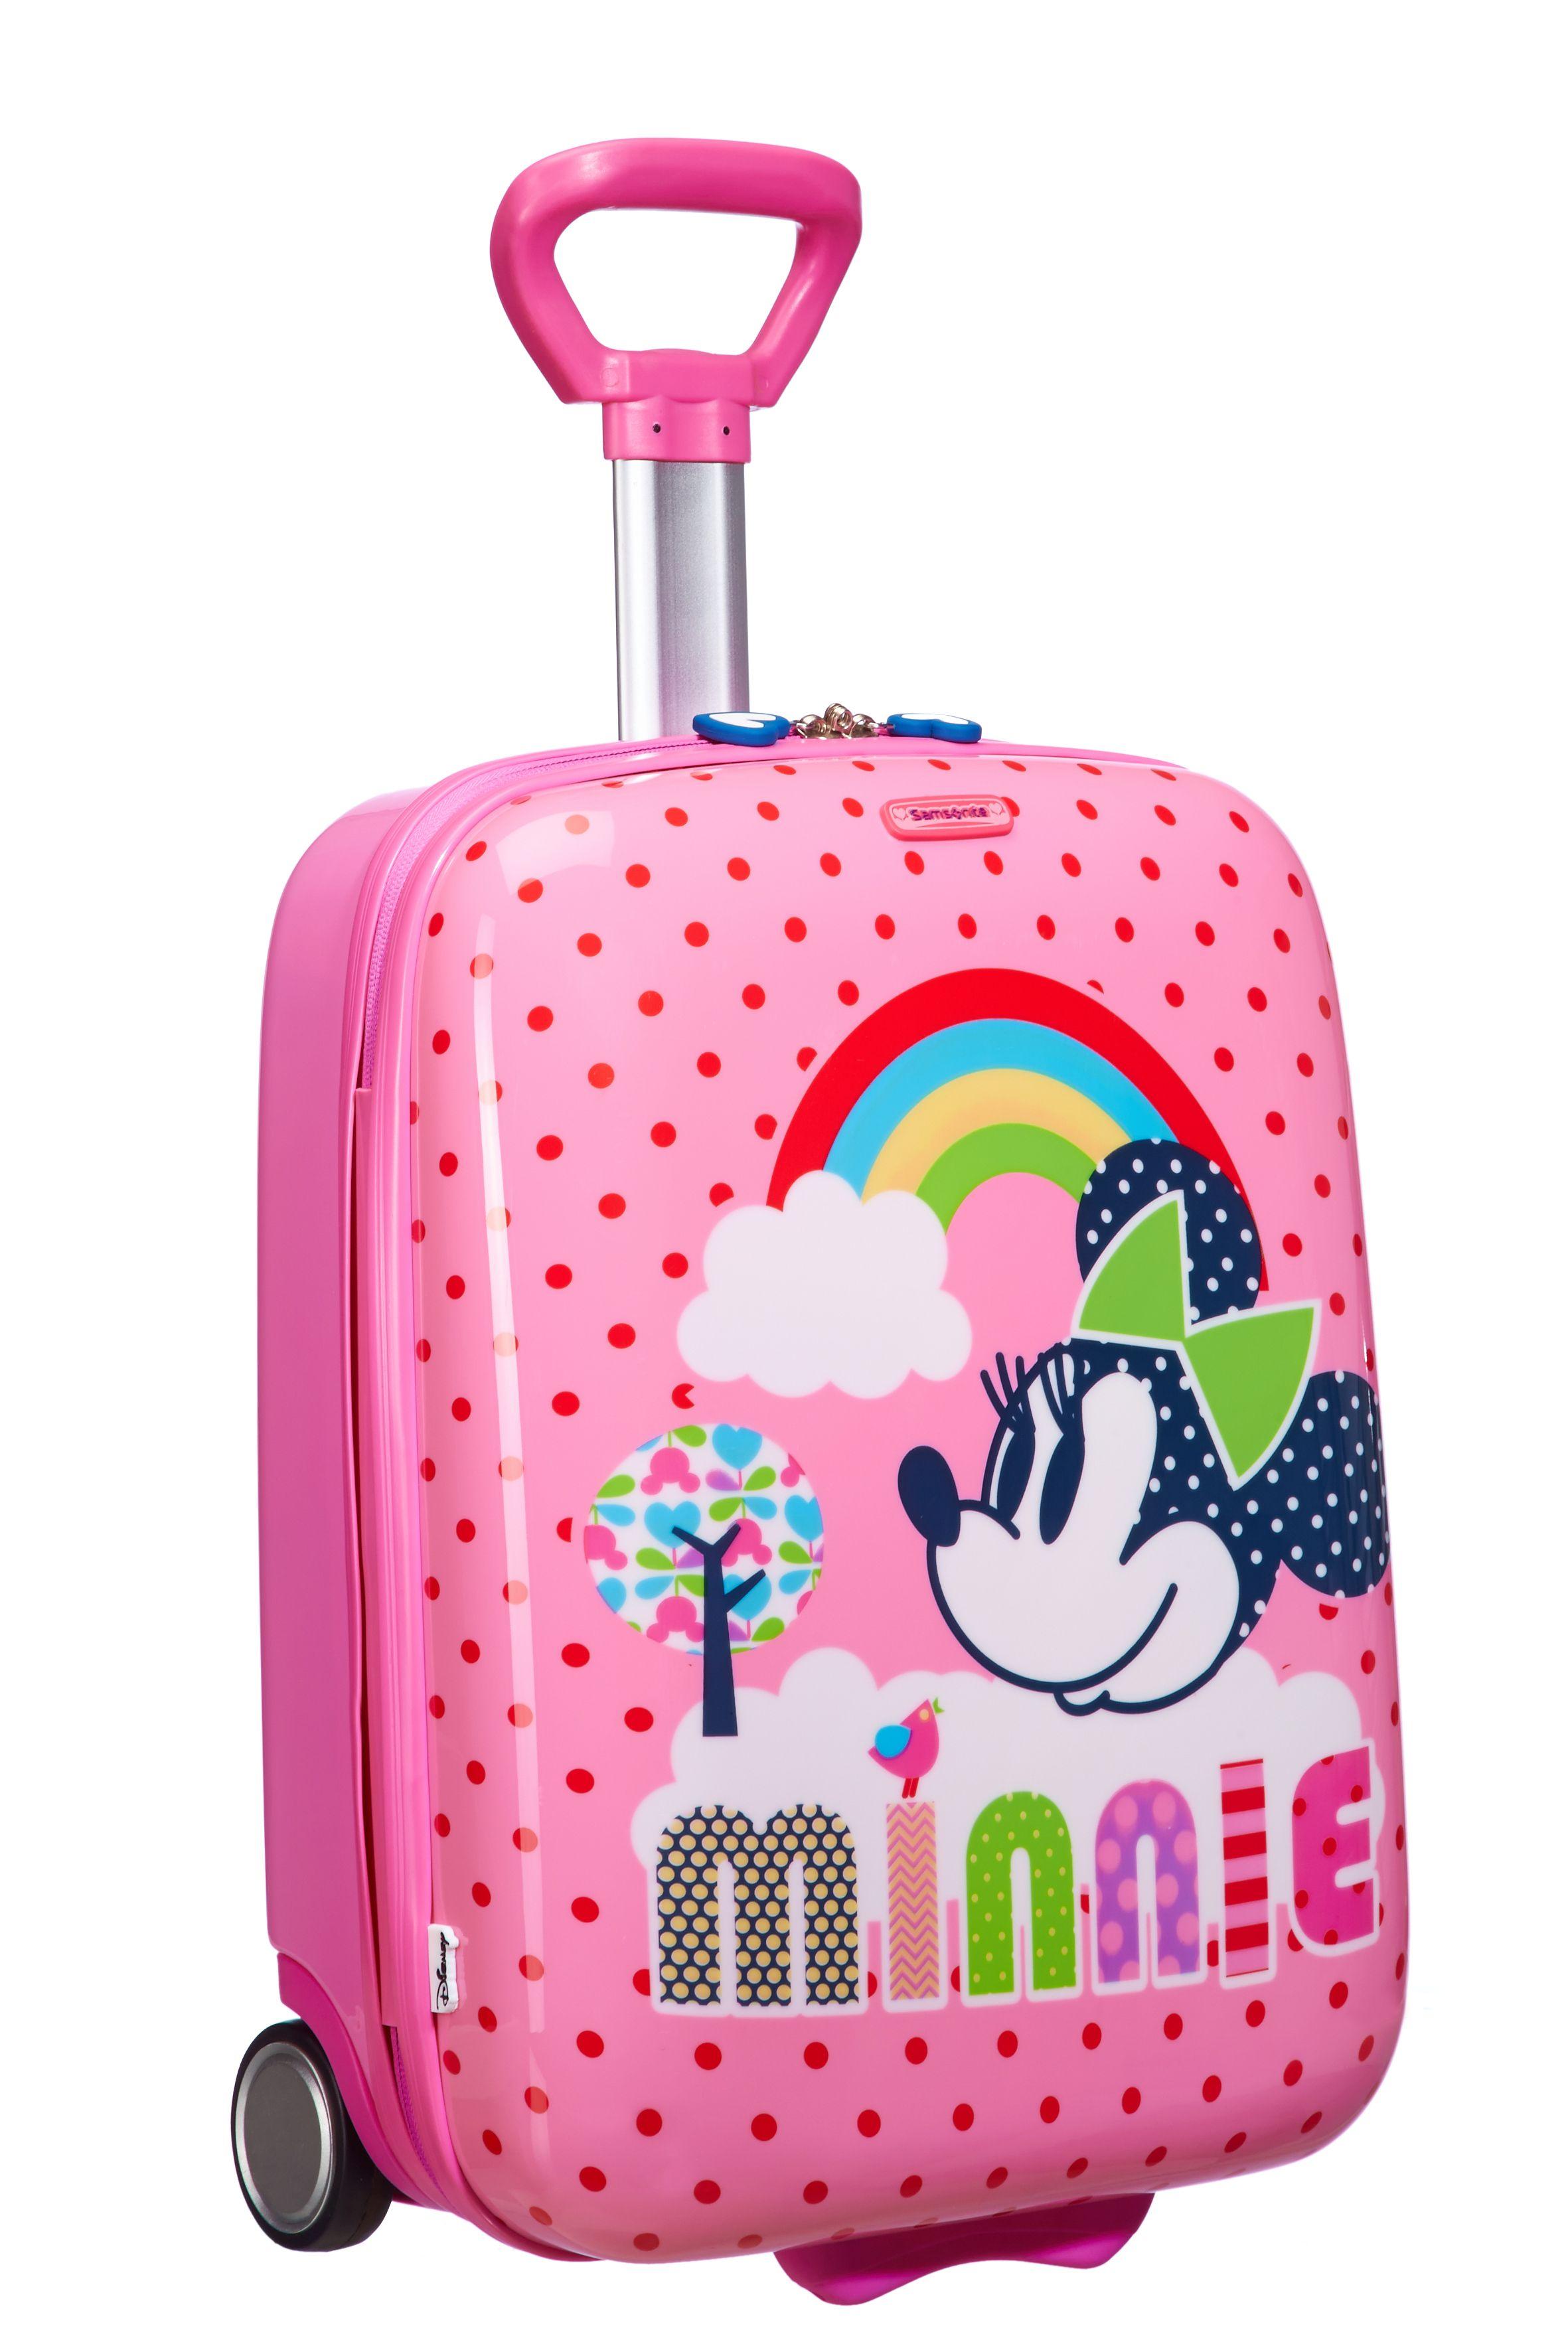 0365a5f857dbb Disney Wonder - Minnie Mouse Hard Upright #Disney #Samsonite #MinnieMouse  #Minnie #Mouse #Travel #Kids #School #Schoolbag #MySamsonite #ByYourSide  #Flowers